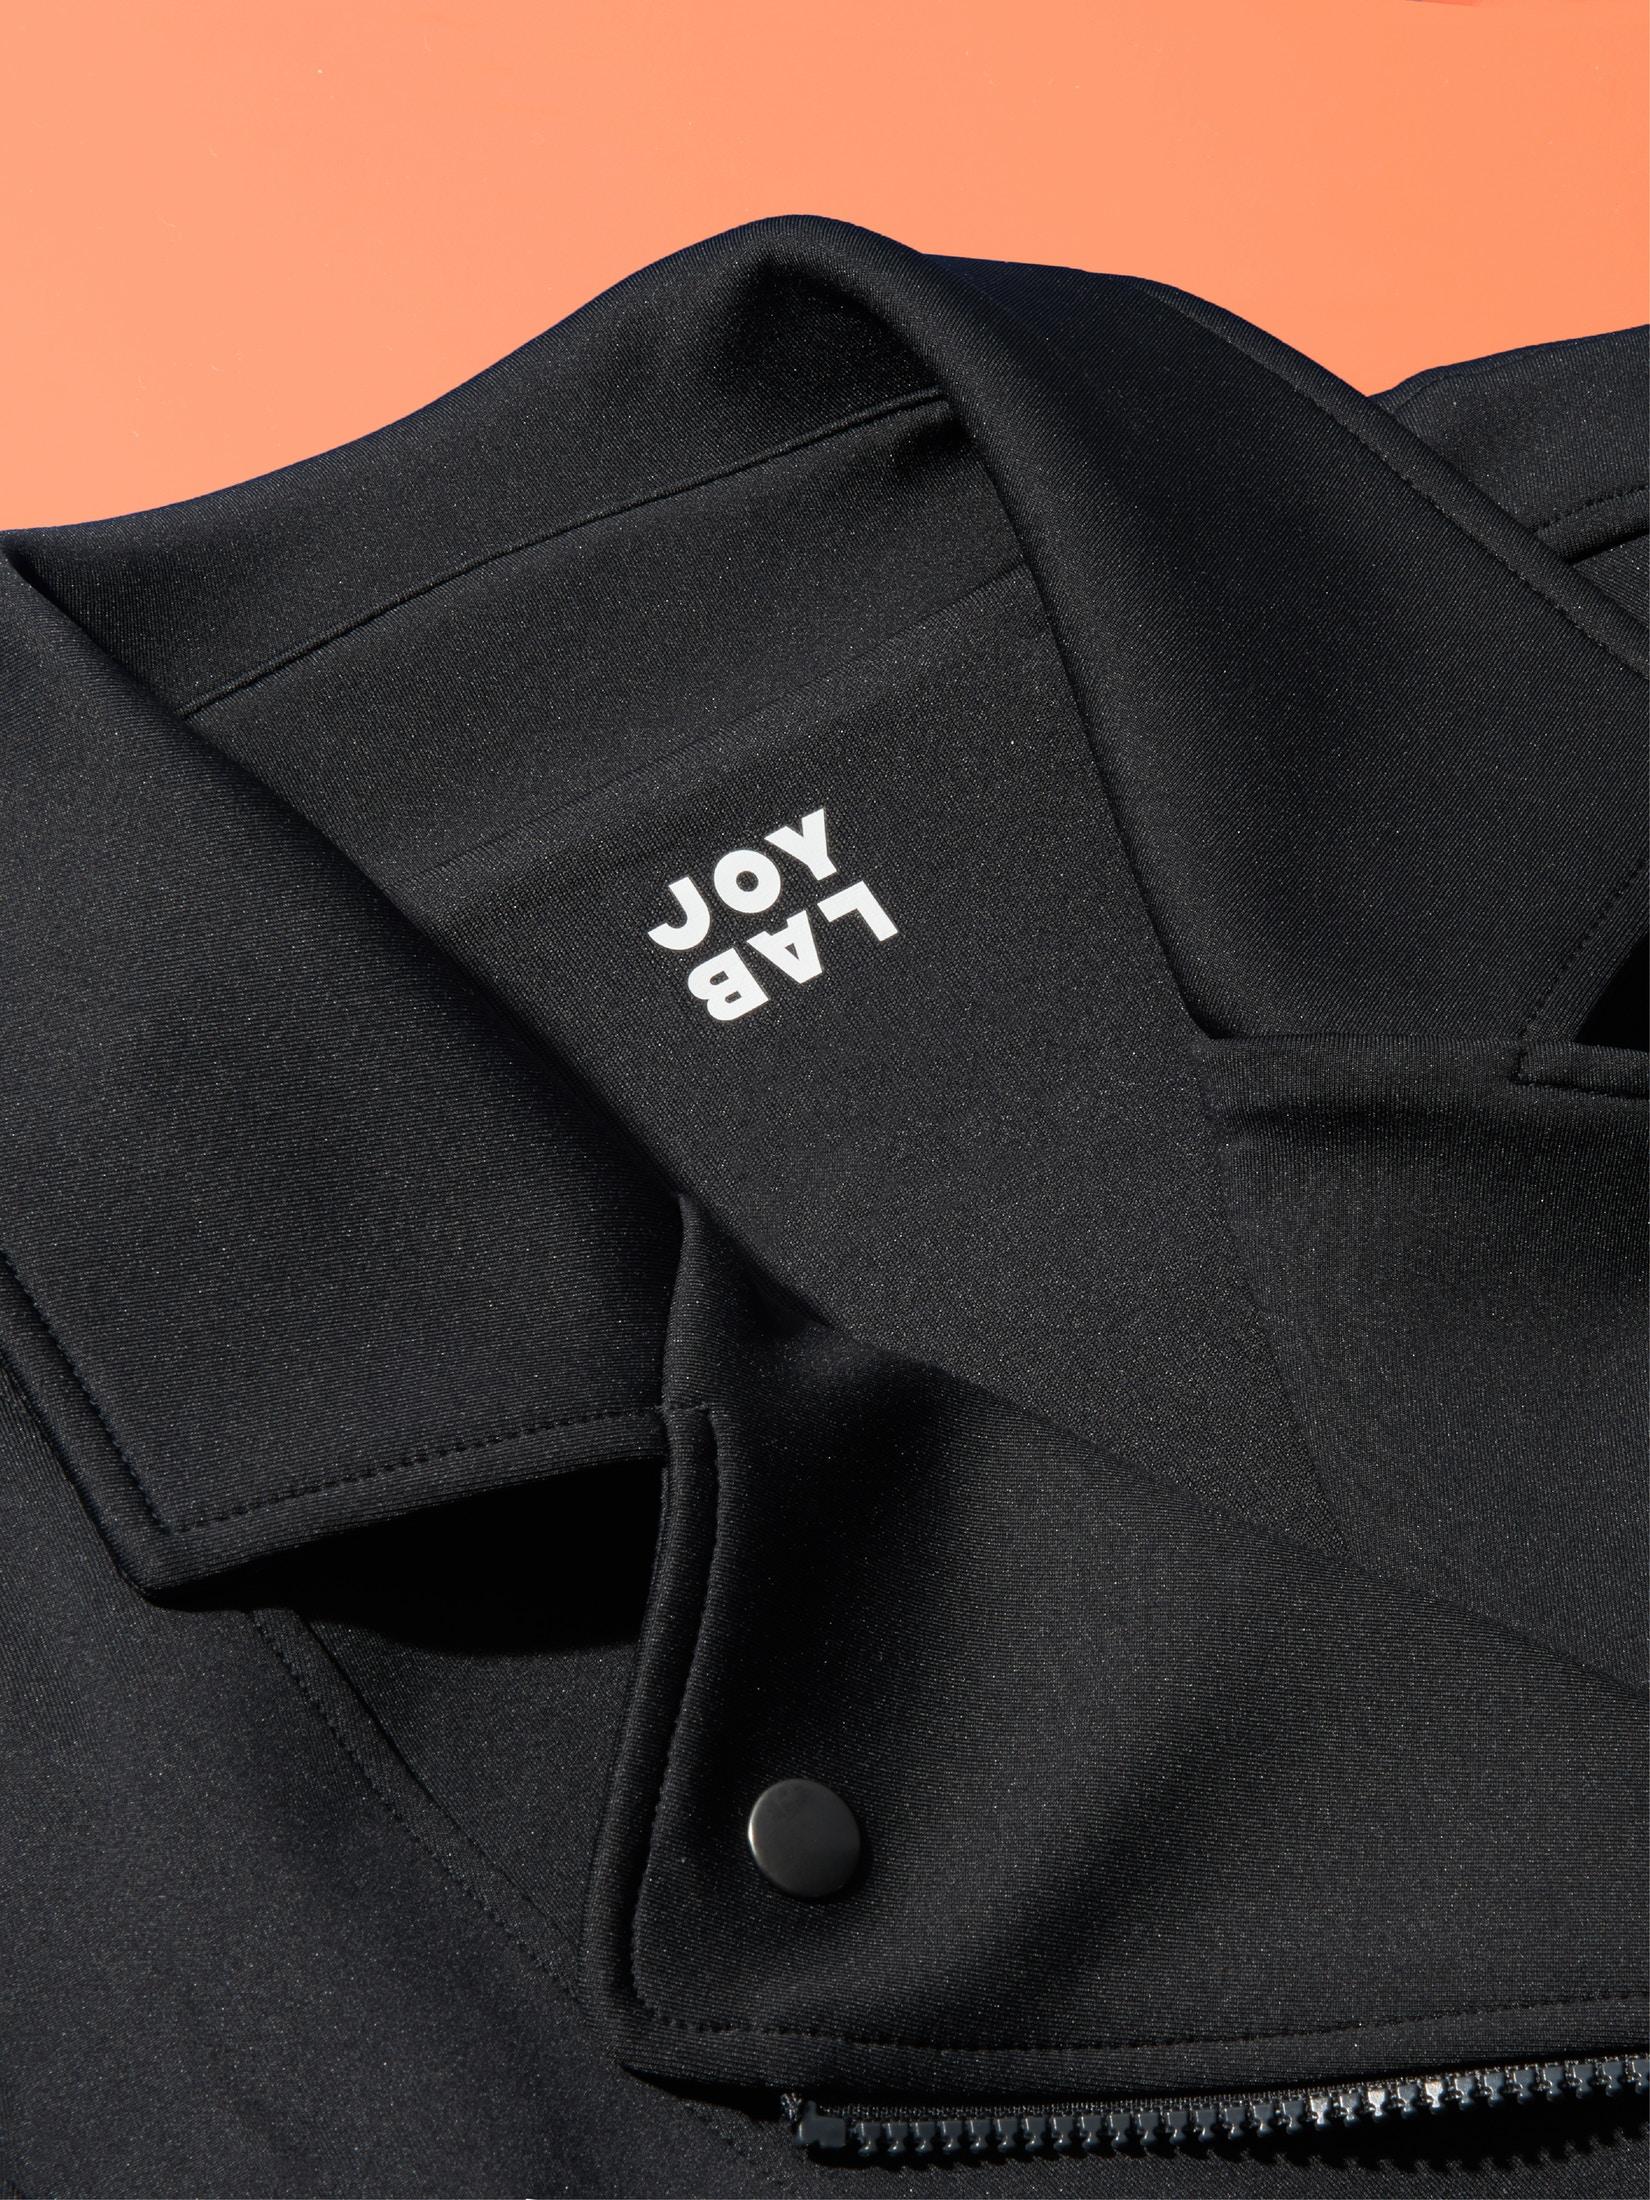 Joylab_CaseStudy_10b